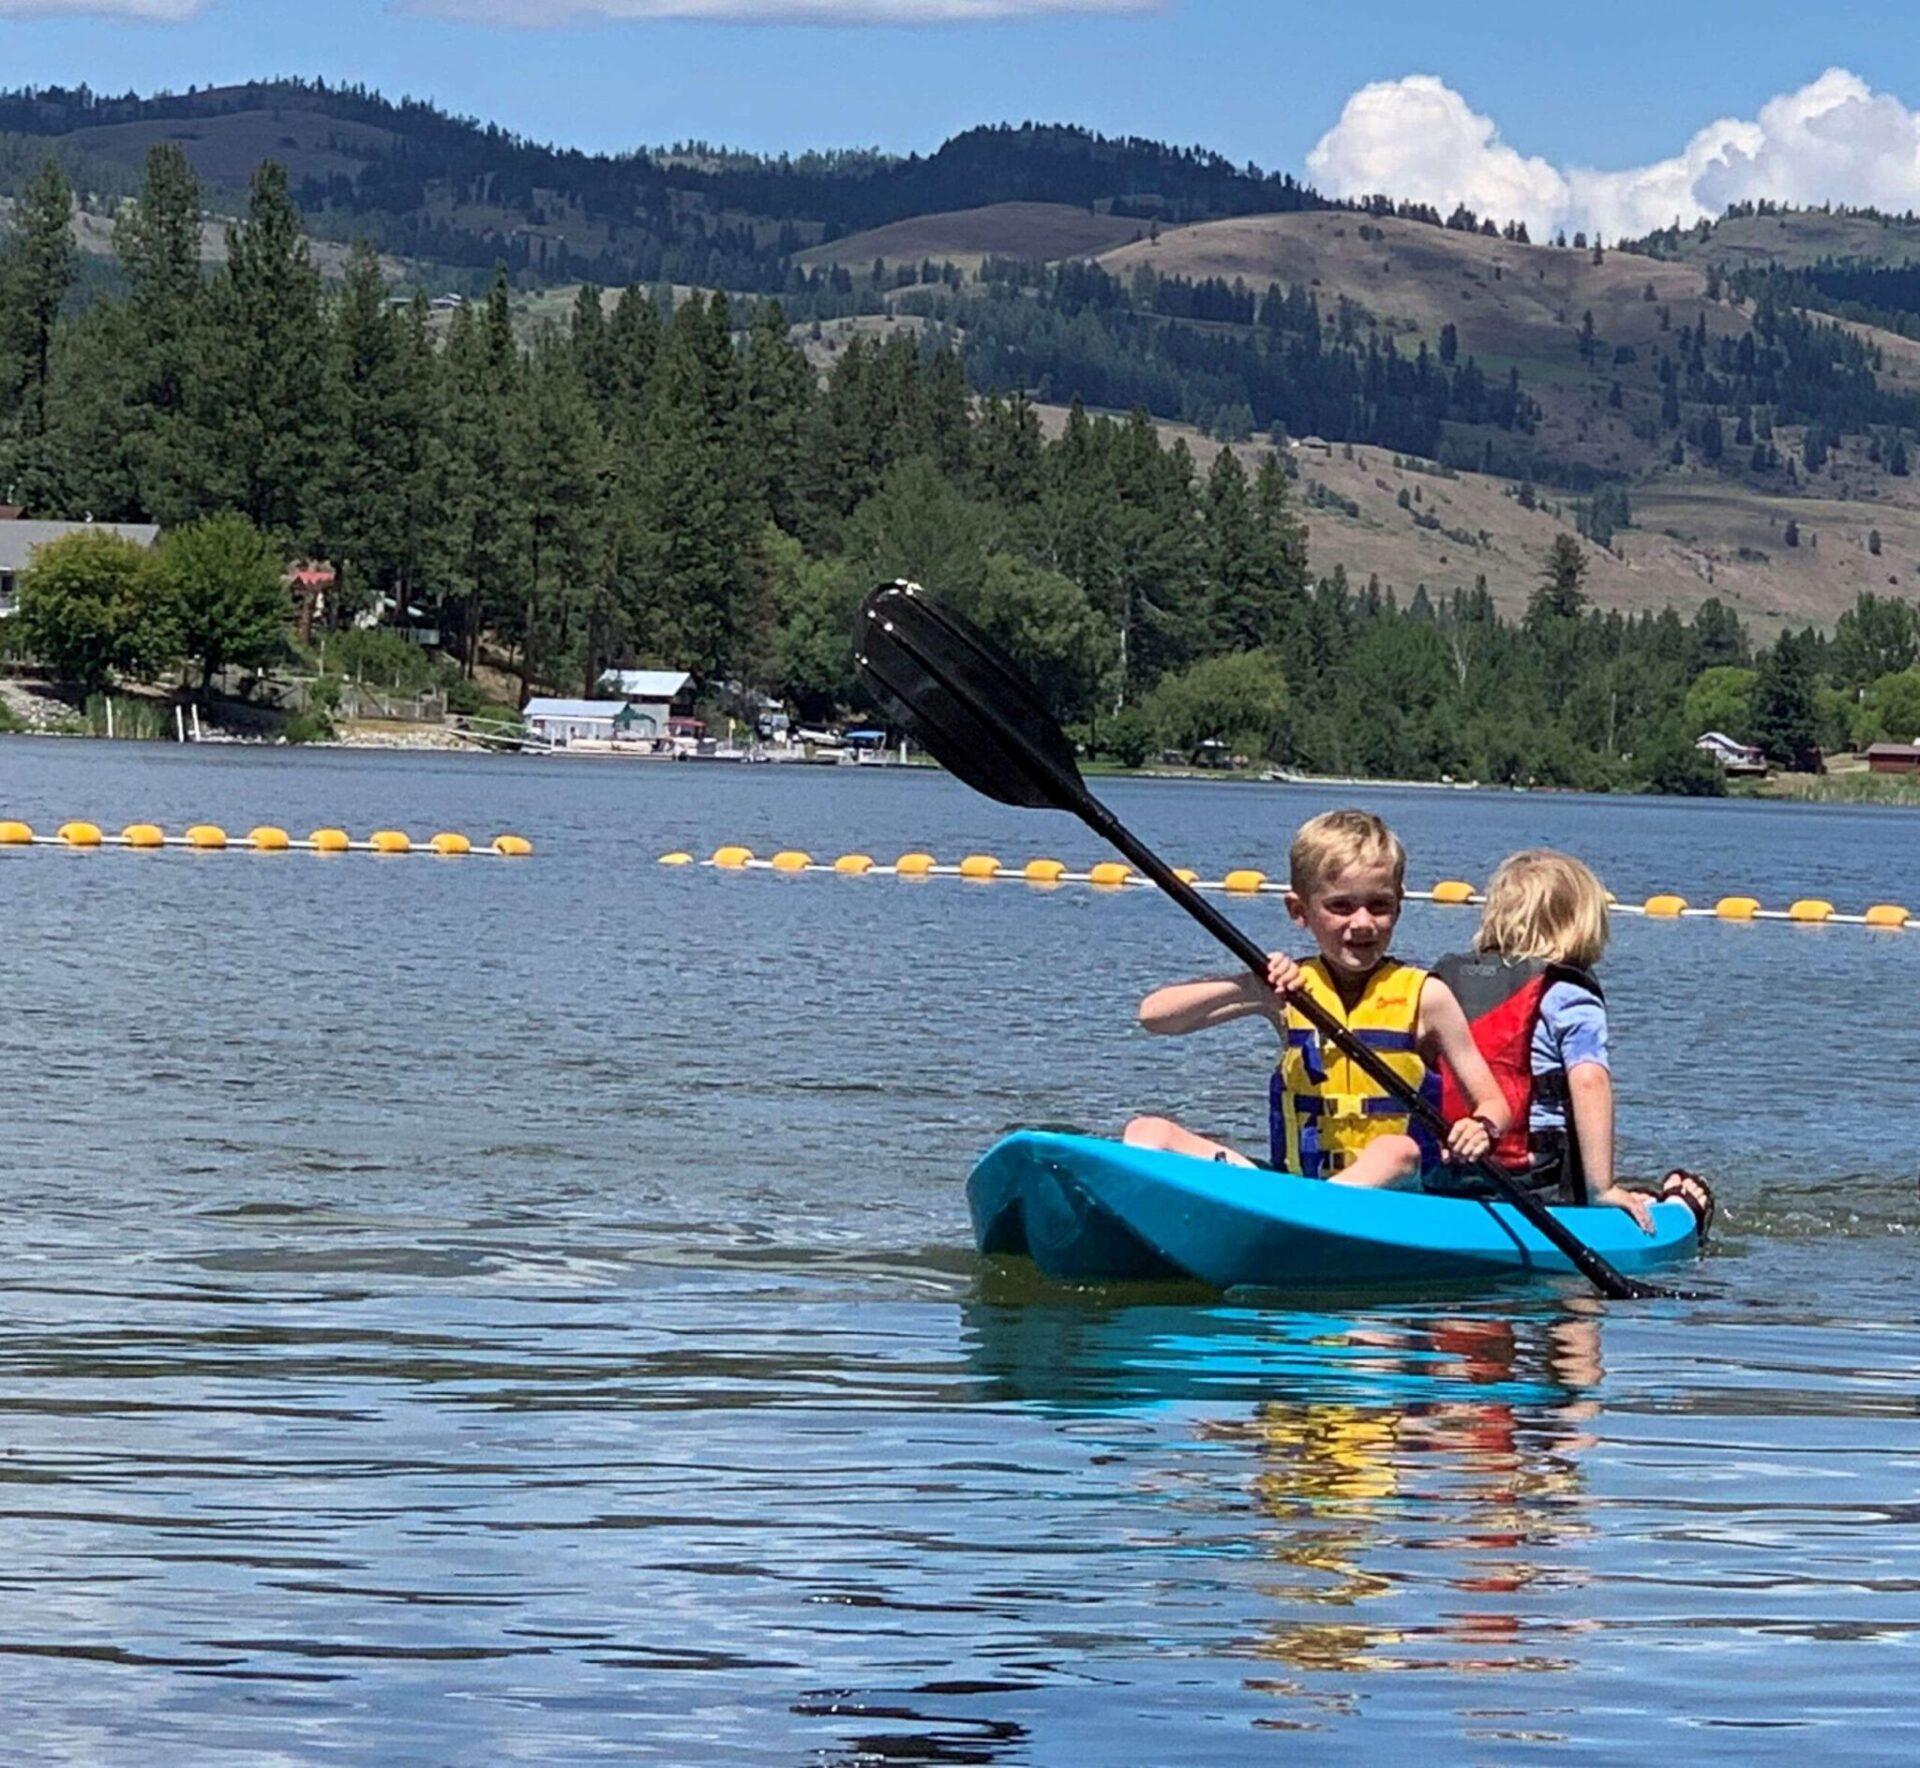 Two kids paddling on a lake.